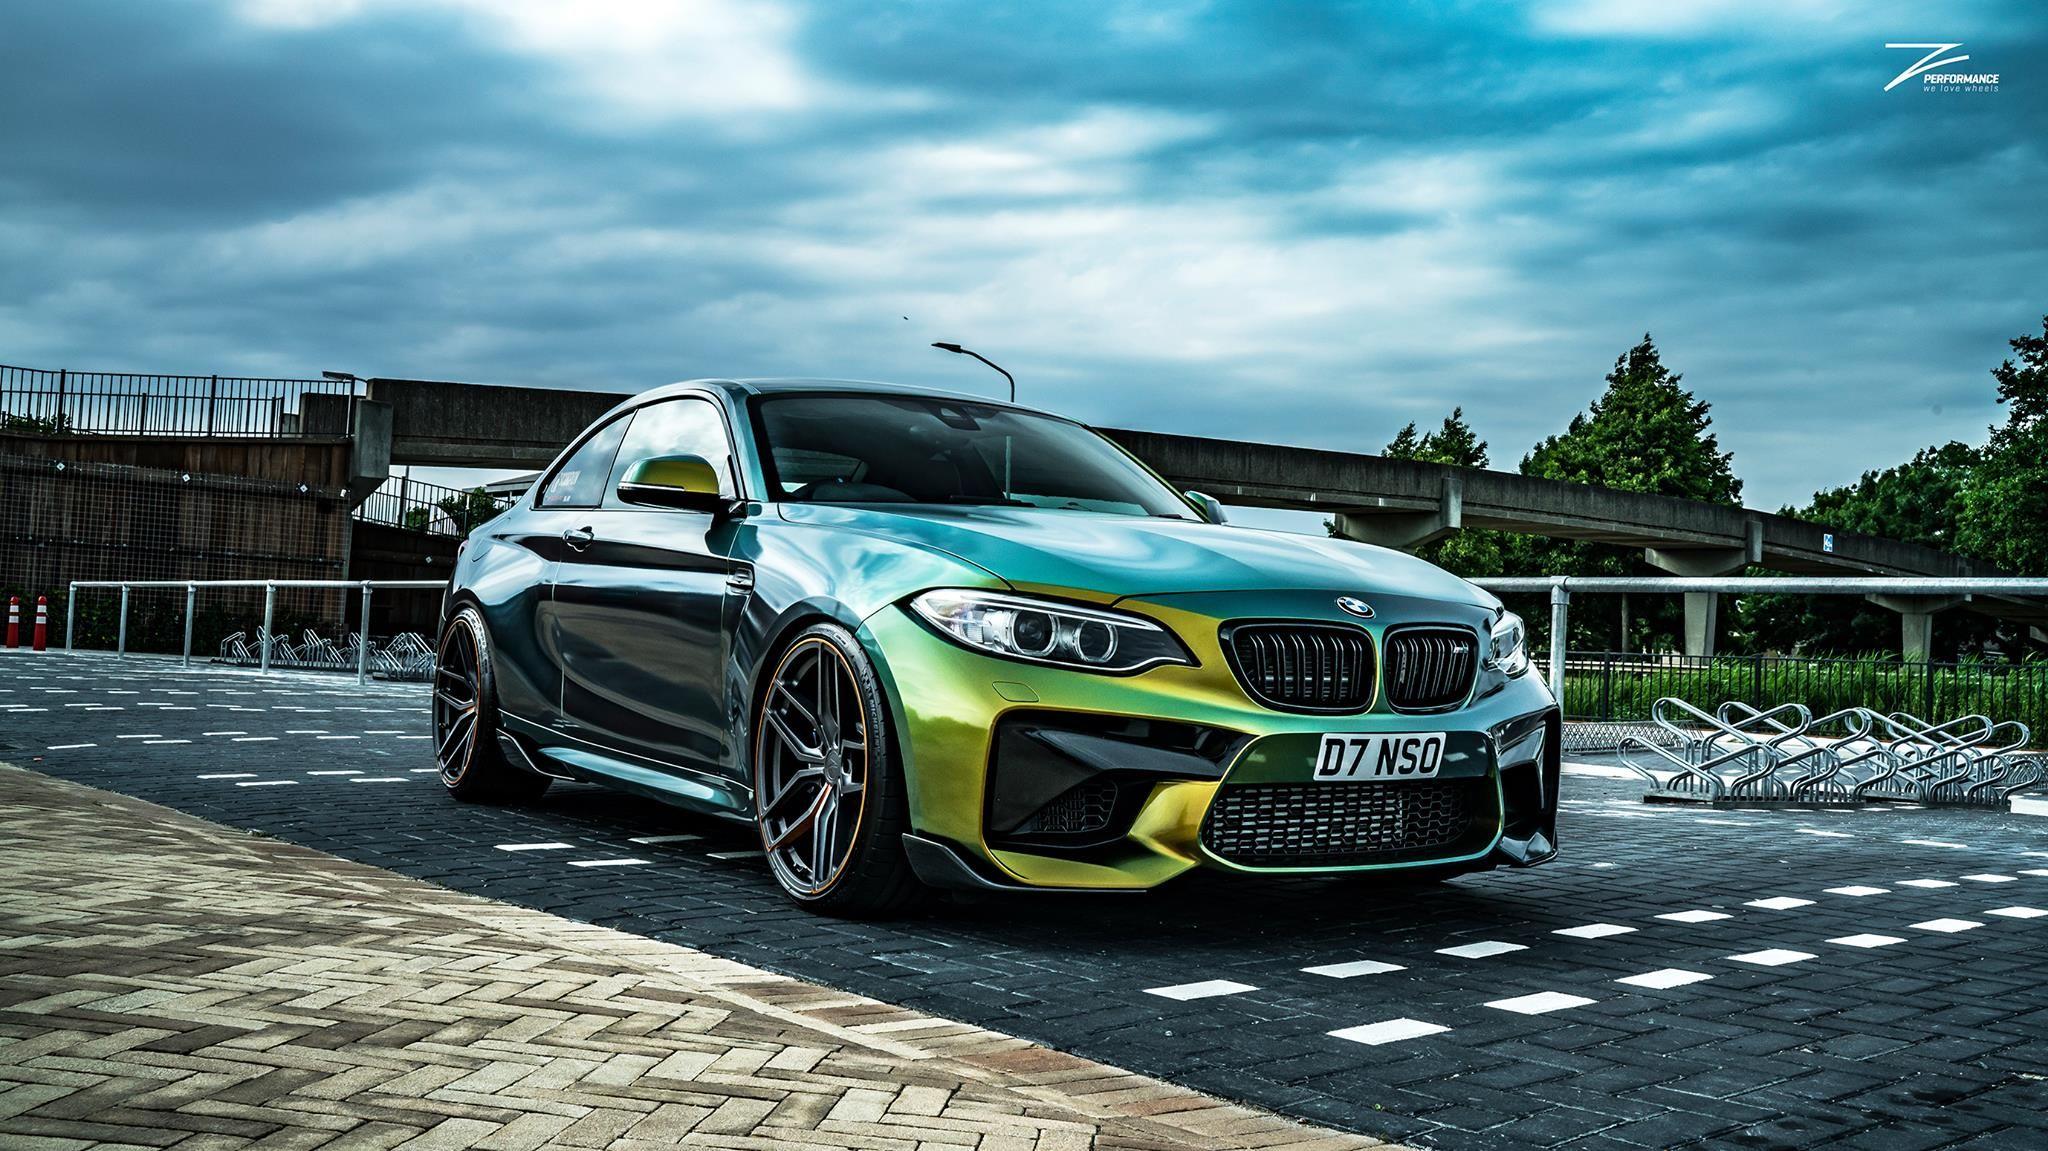 #BMW #F87 #M2 #Coupe #MPerformance #xDrive # ...